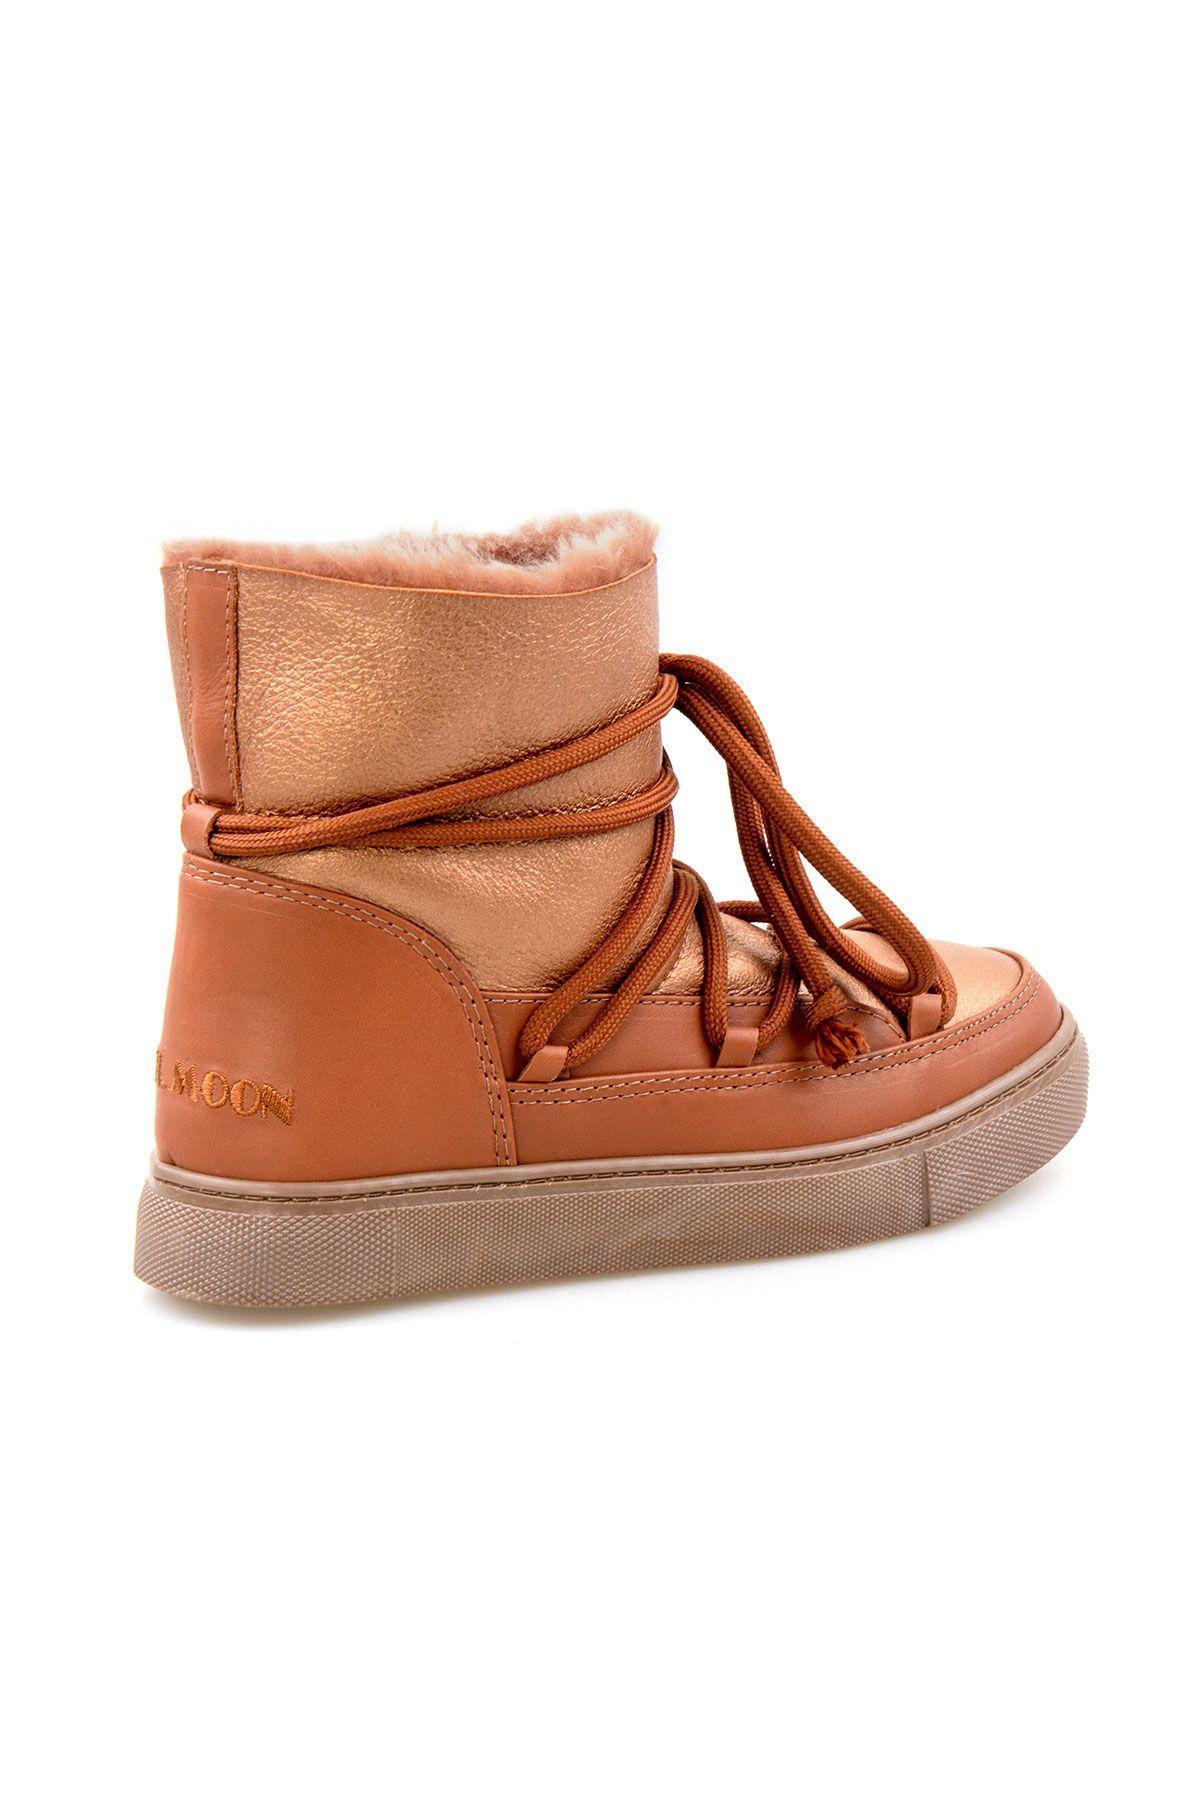 Cool Moon Hakiki Kürklü Kadın Sneakers 355108 Taba